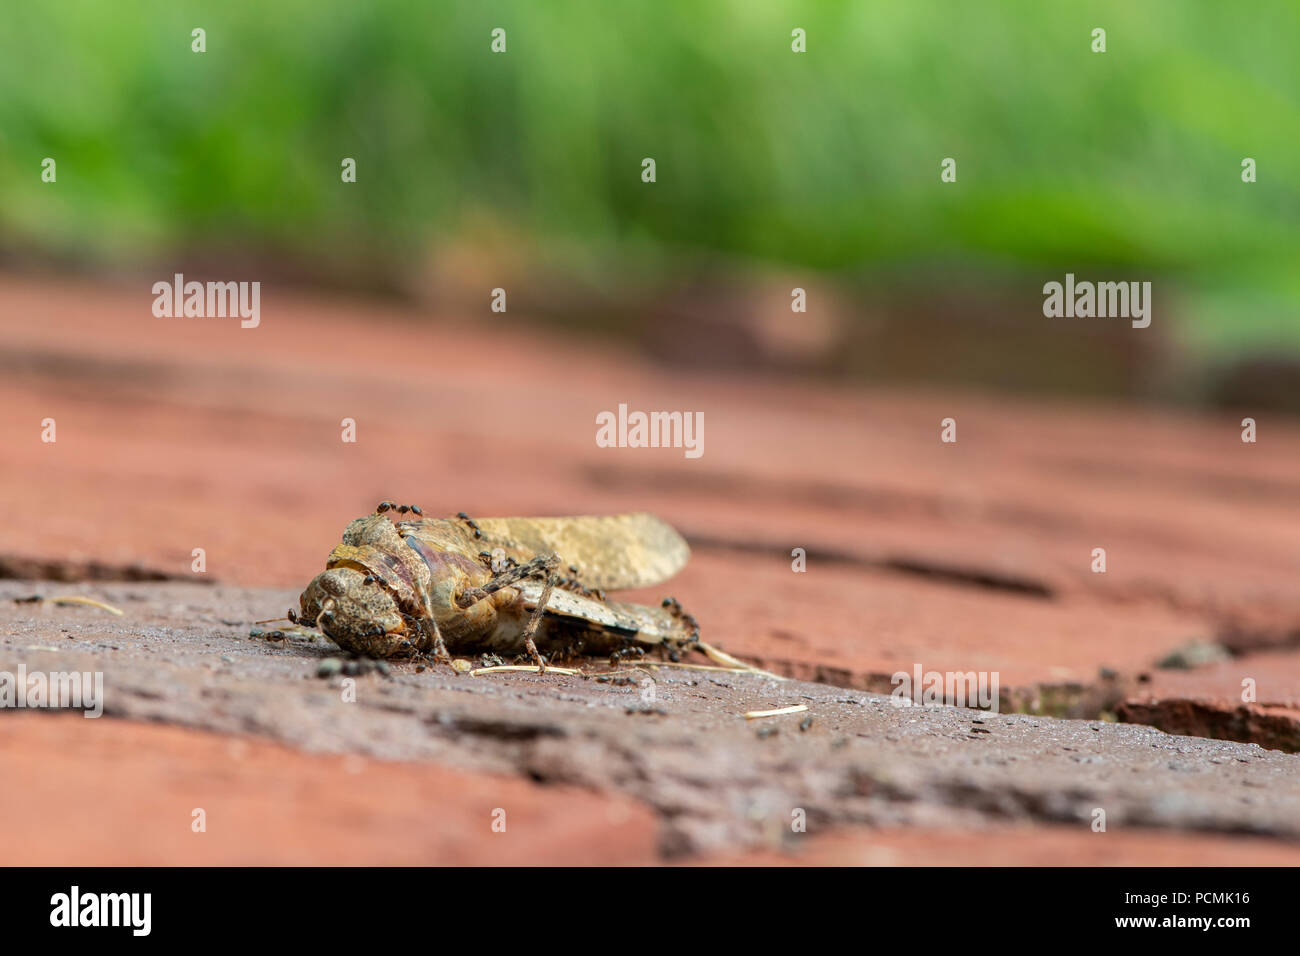 Ants eating a dead grasshopper - Stock Image